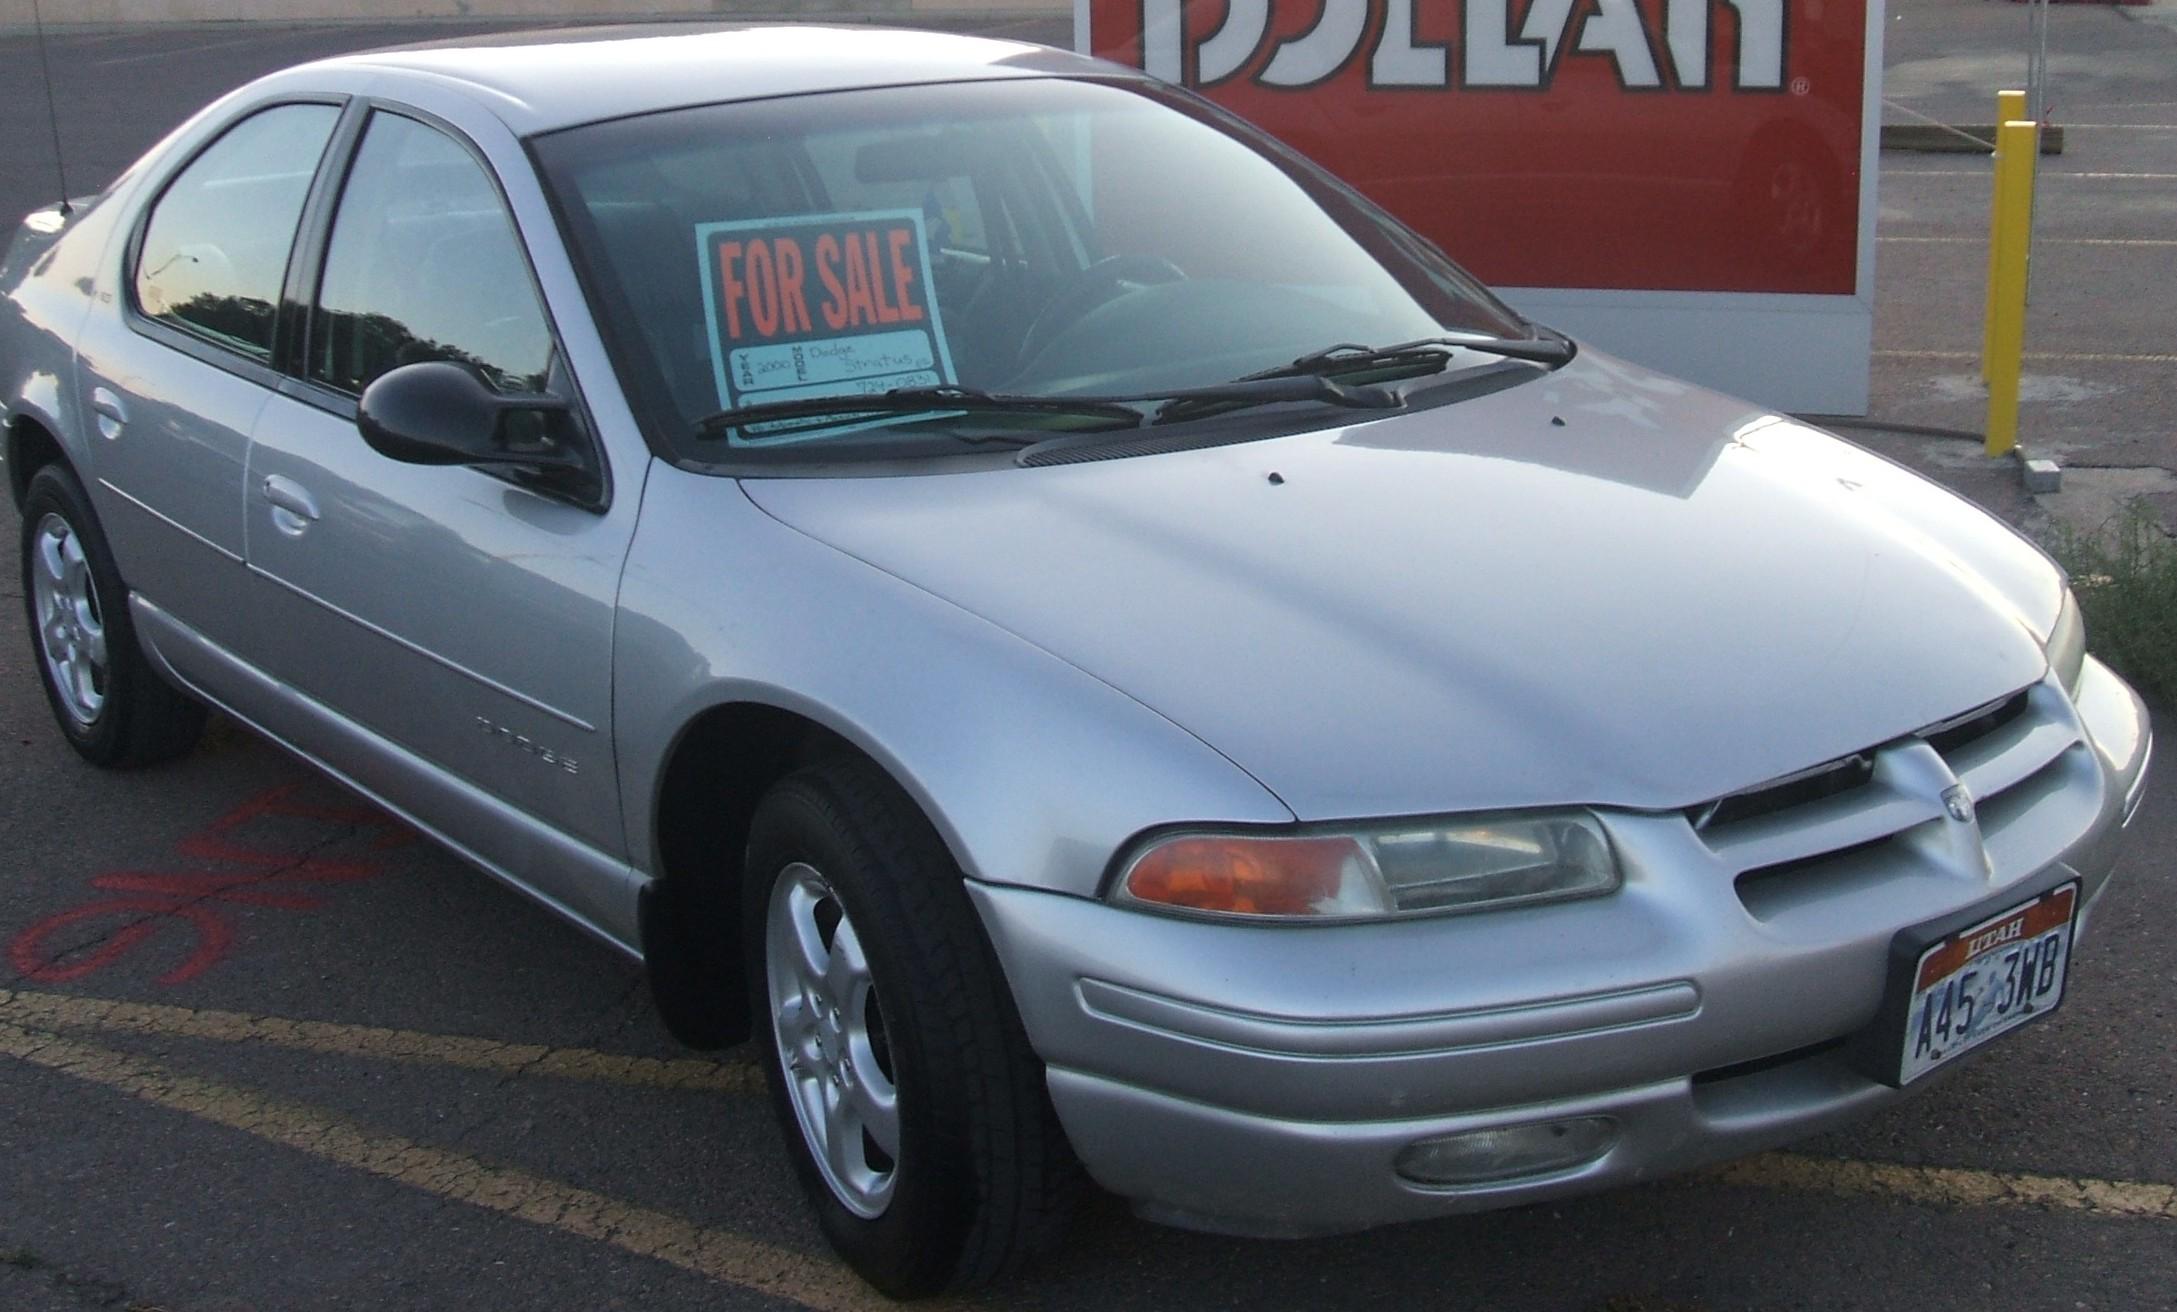 2000 Dodge Stratus Partsopen